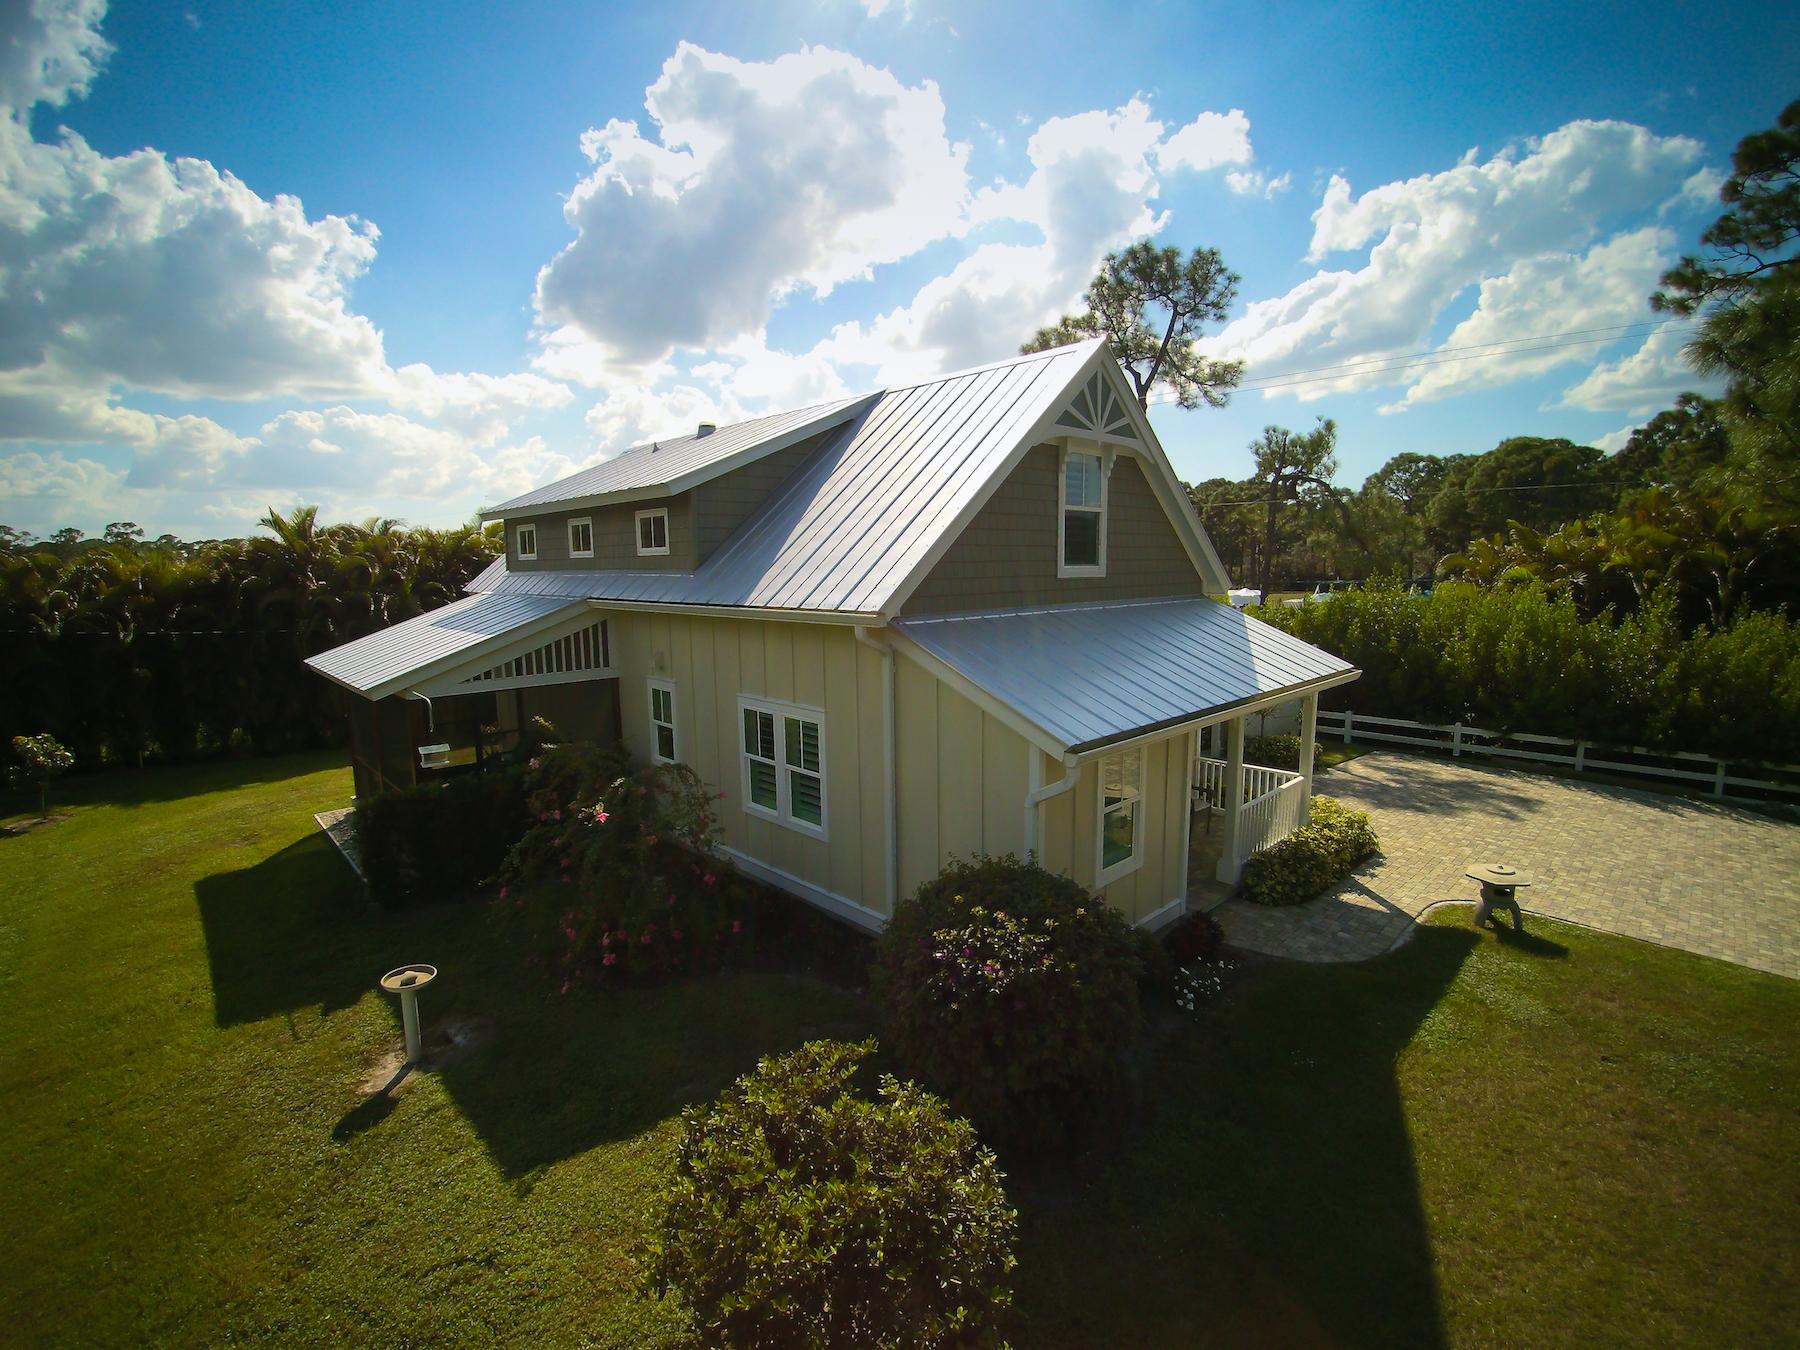 Florida Cracker-Style Home | Estero, Florida two-story custom home